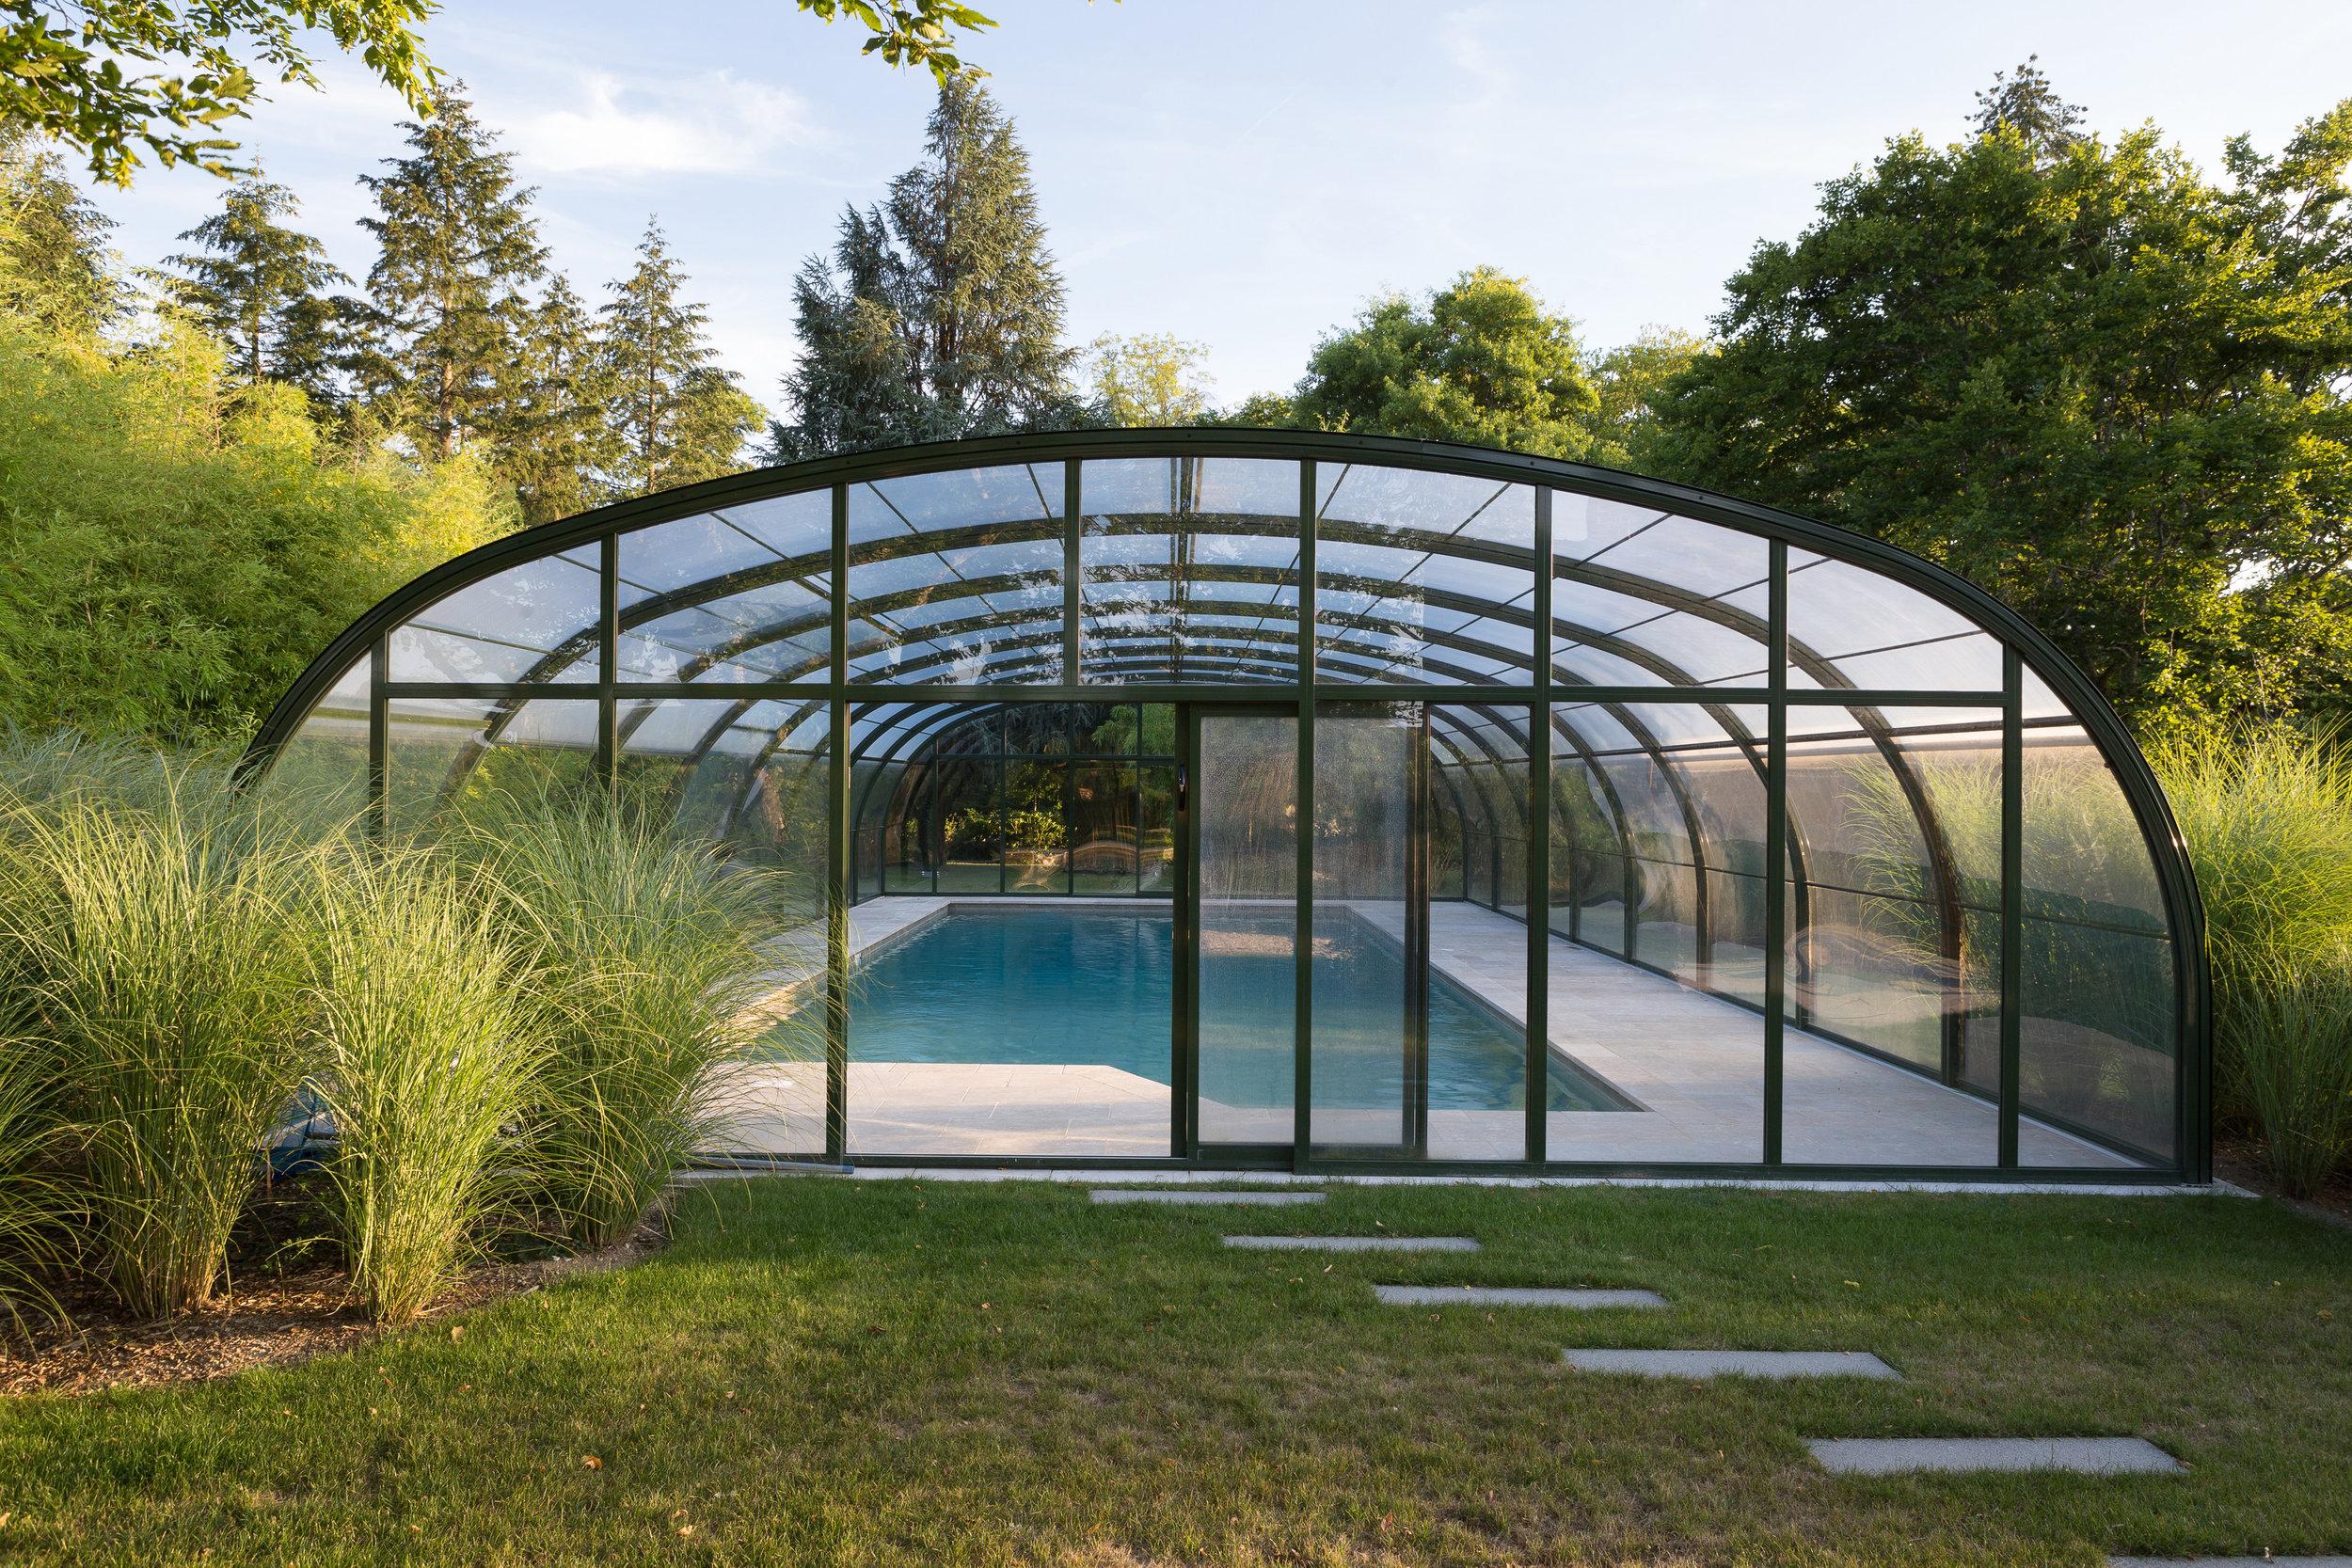 jardin_privé_vouzon_sologne_terrasses_jardins_outdoor_design_christophe_gautrand_paysagiste_4.jpg